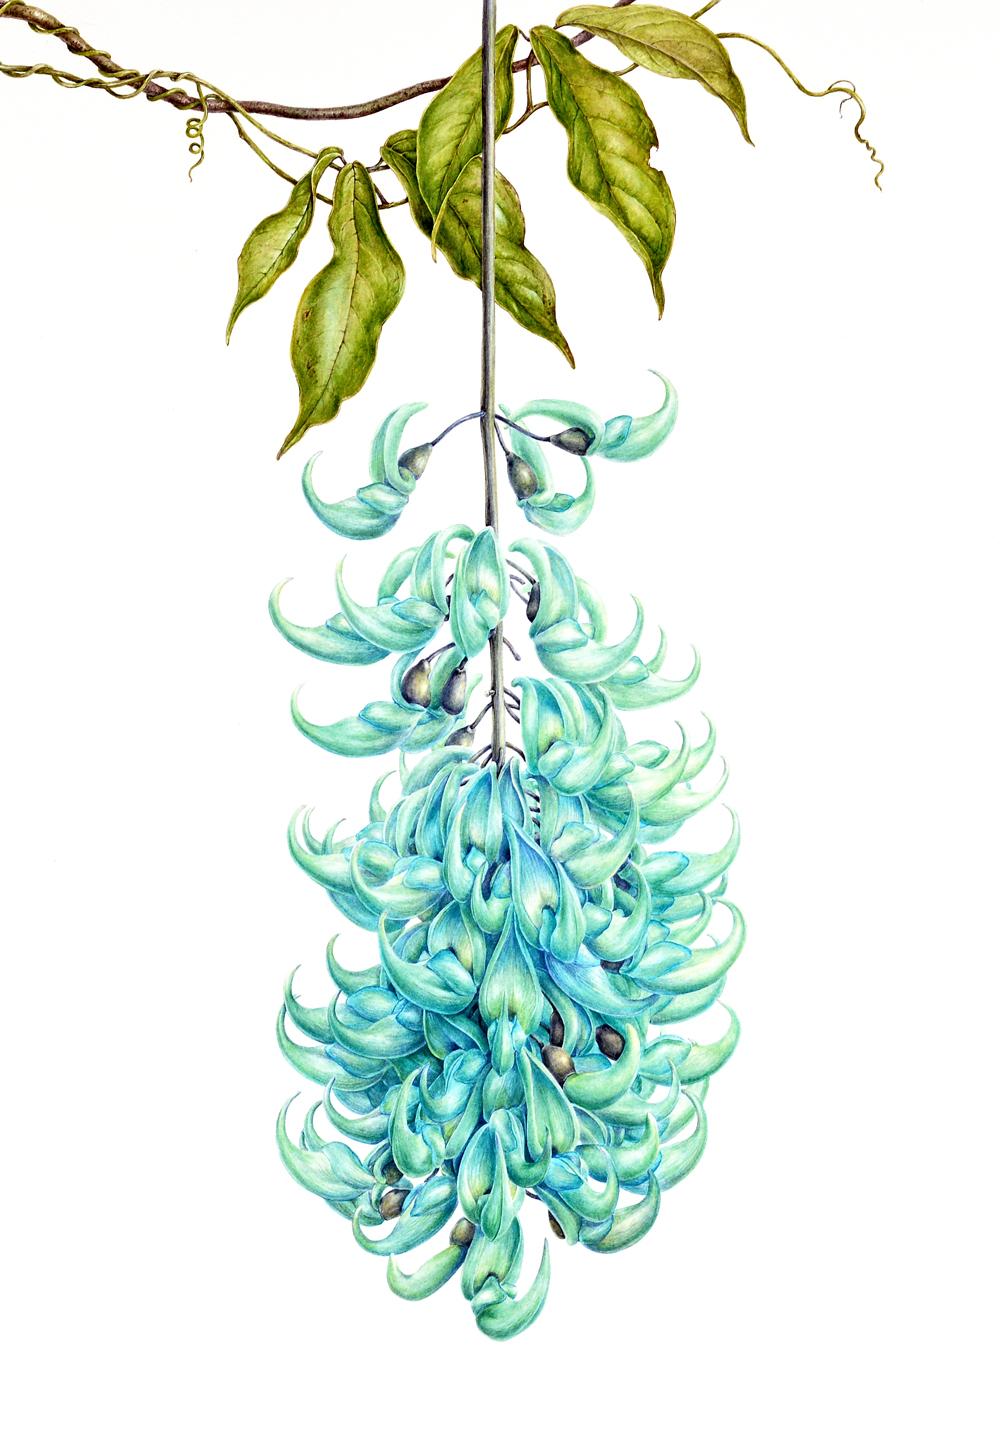 final JPEG image of jade vine painting saved for web